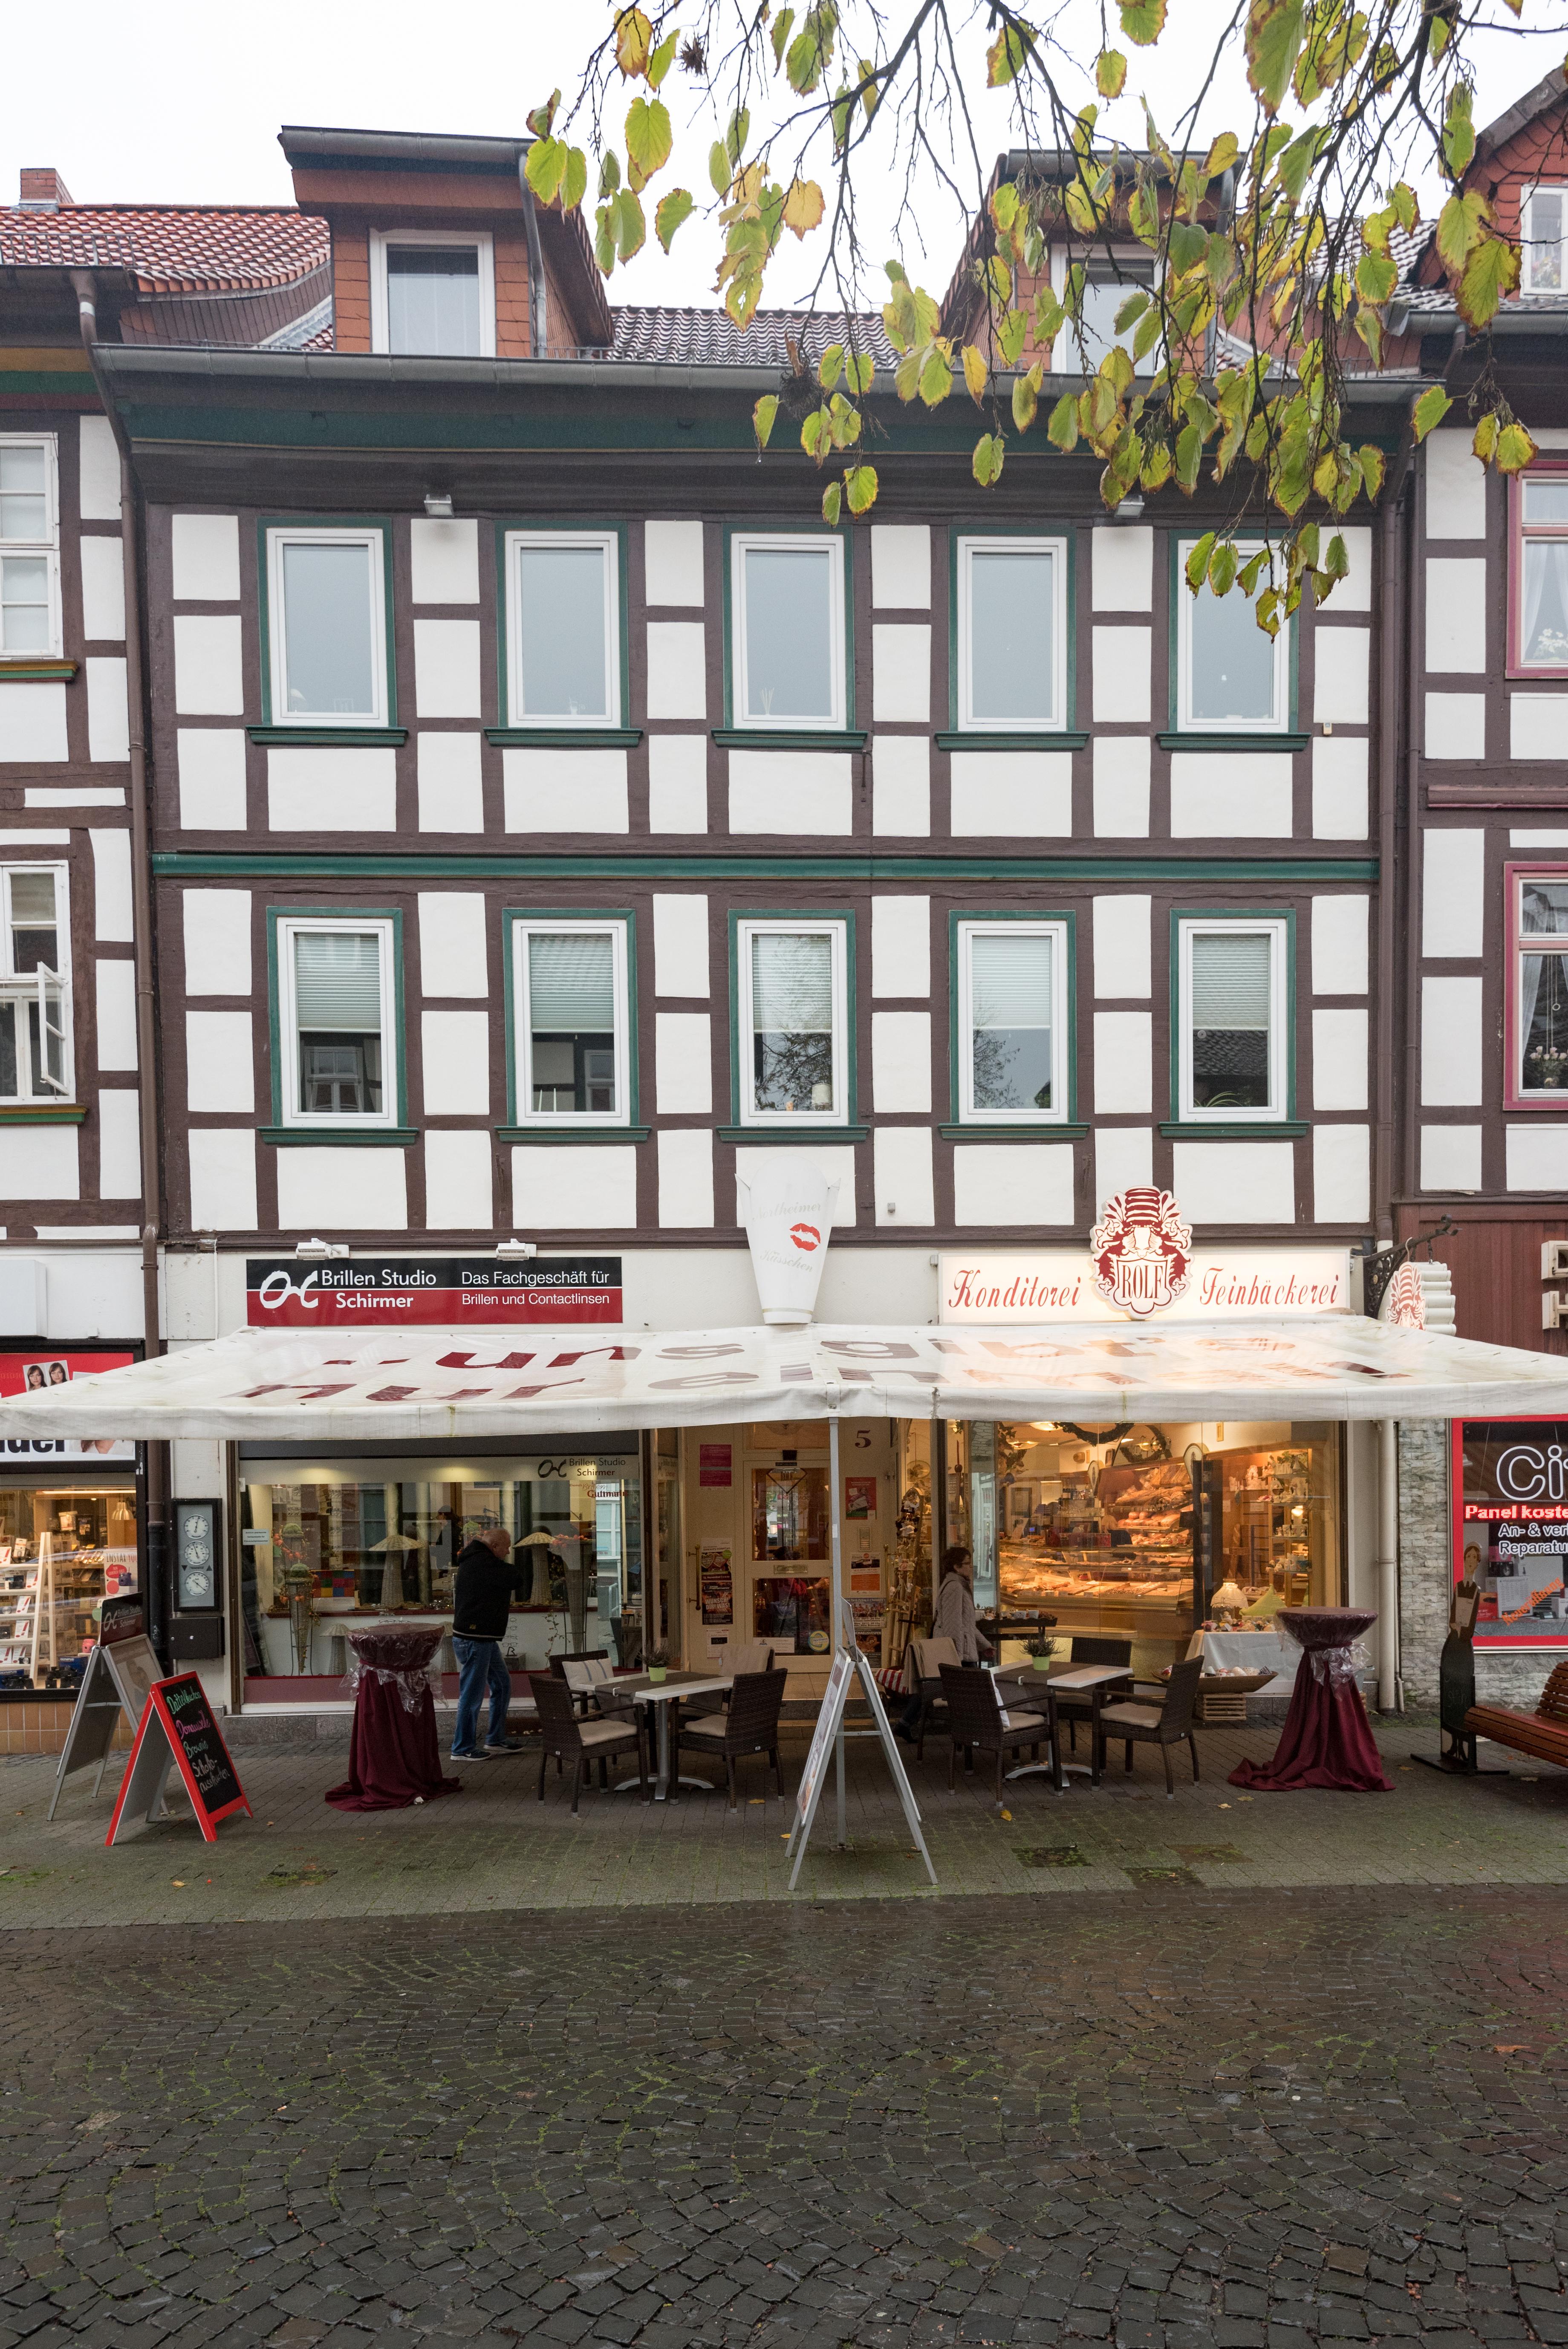 File Northeim Breite Strasse 6 20171101 001 Jpg Wikimedia Commons